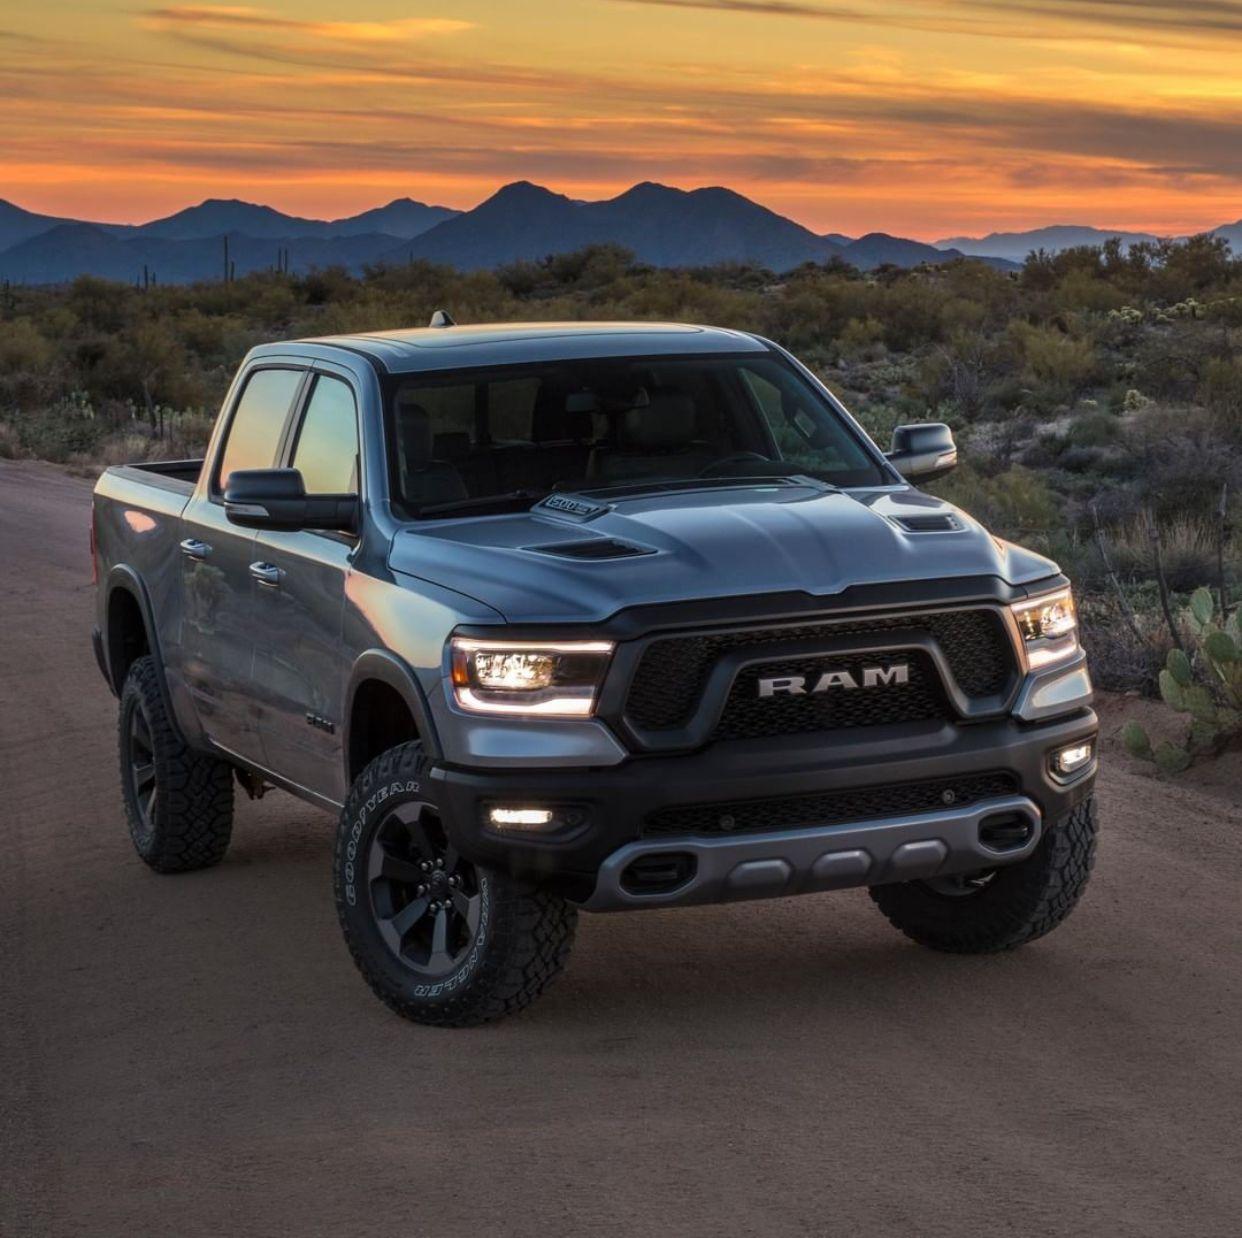 Pin By Cody Jo Olson On 3 Dodge Jeep Ram Ram Trucks Chevy Reaper Trucks